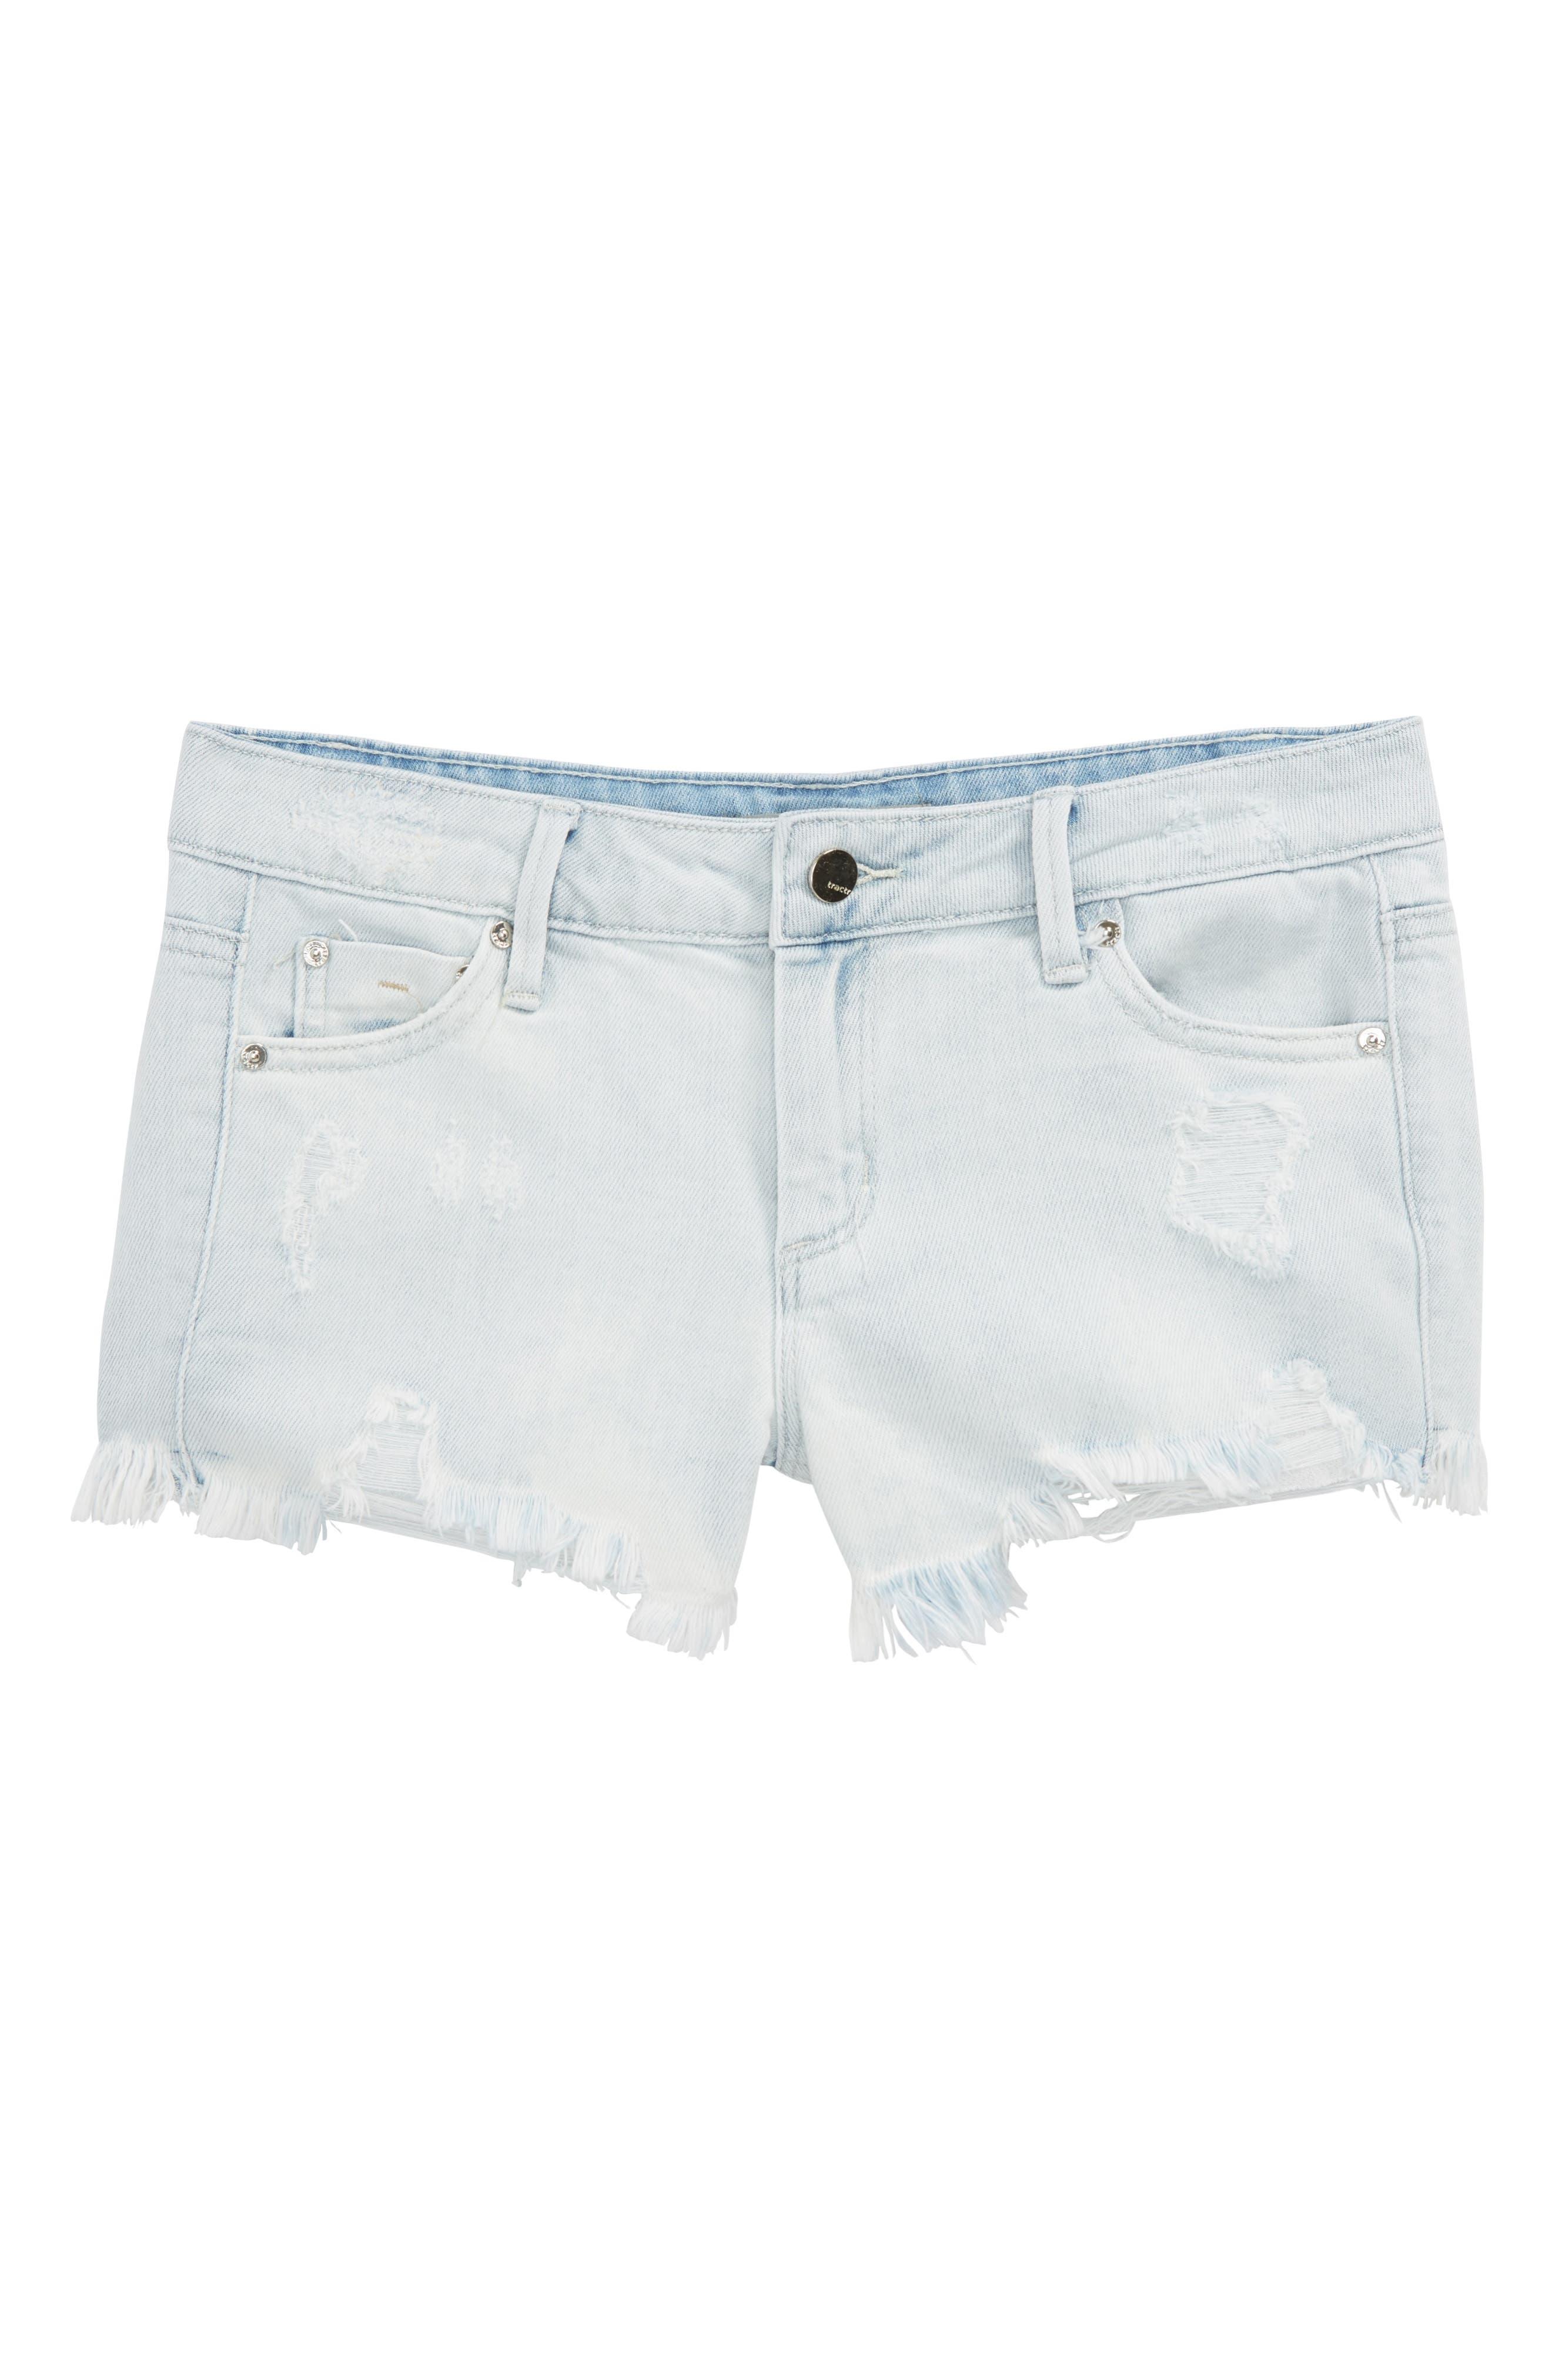 Destructed Frayed Denim Shorts,                             Main thumbnail 1, color,                             Light Indigo